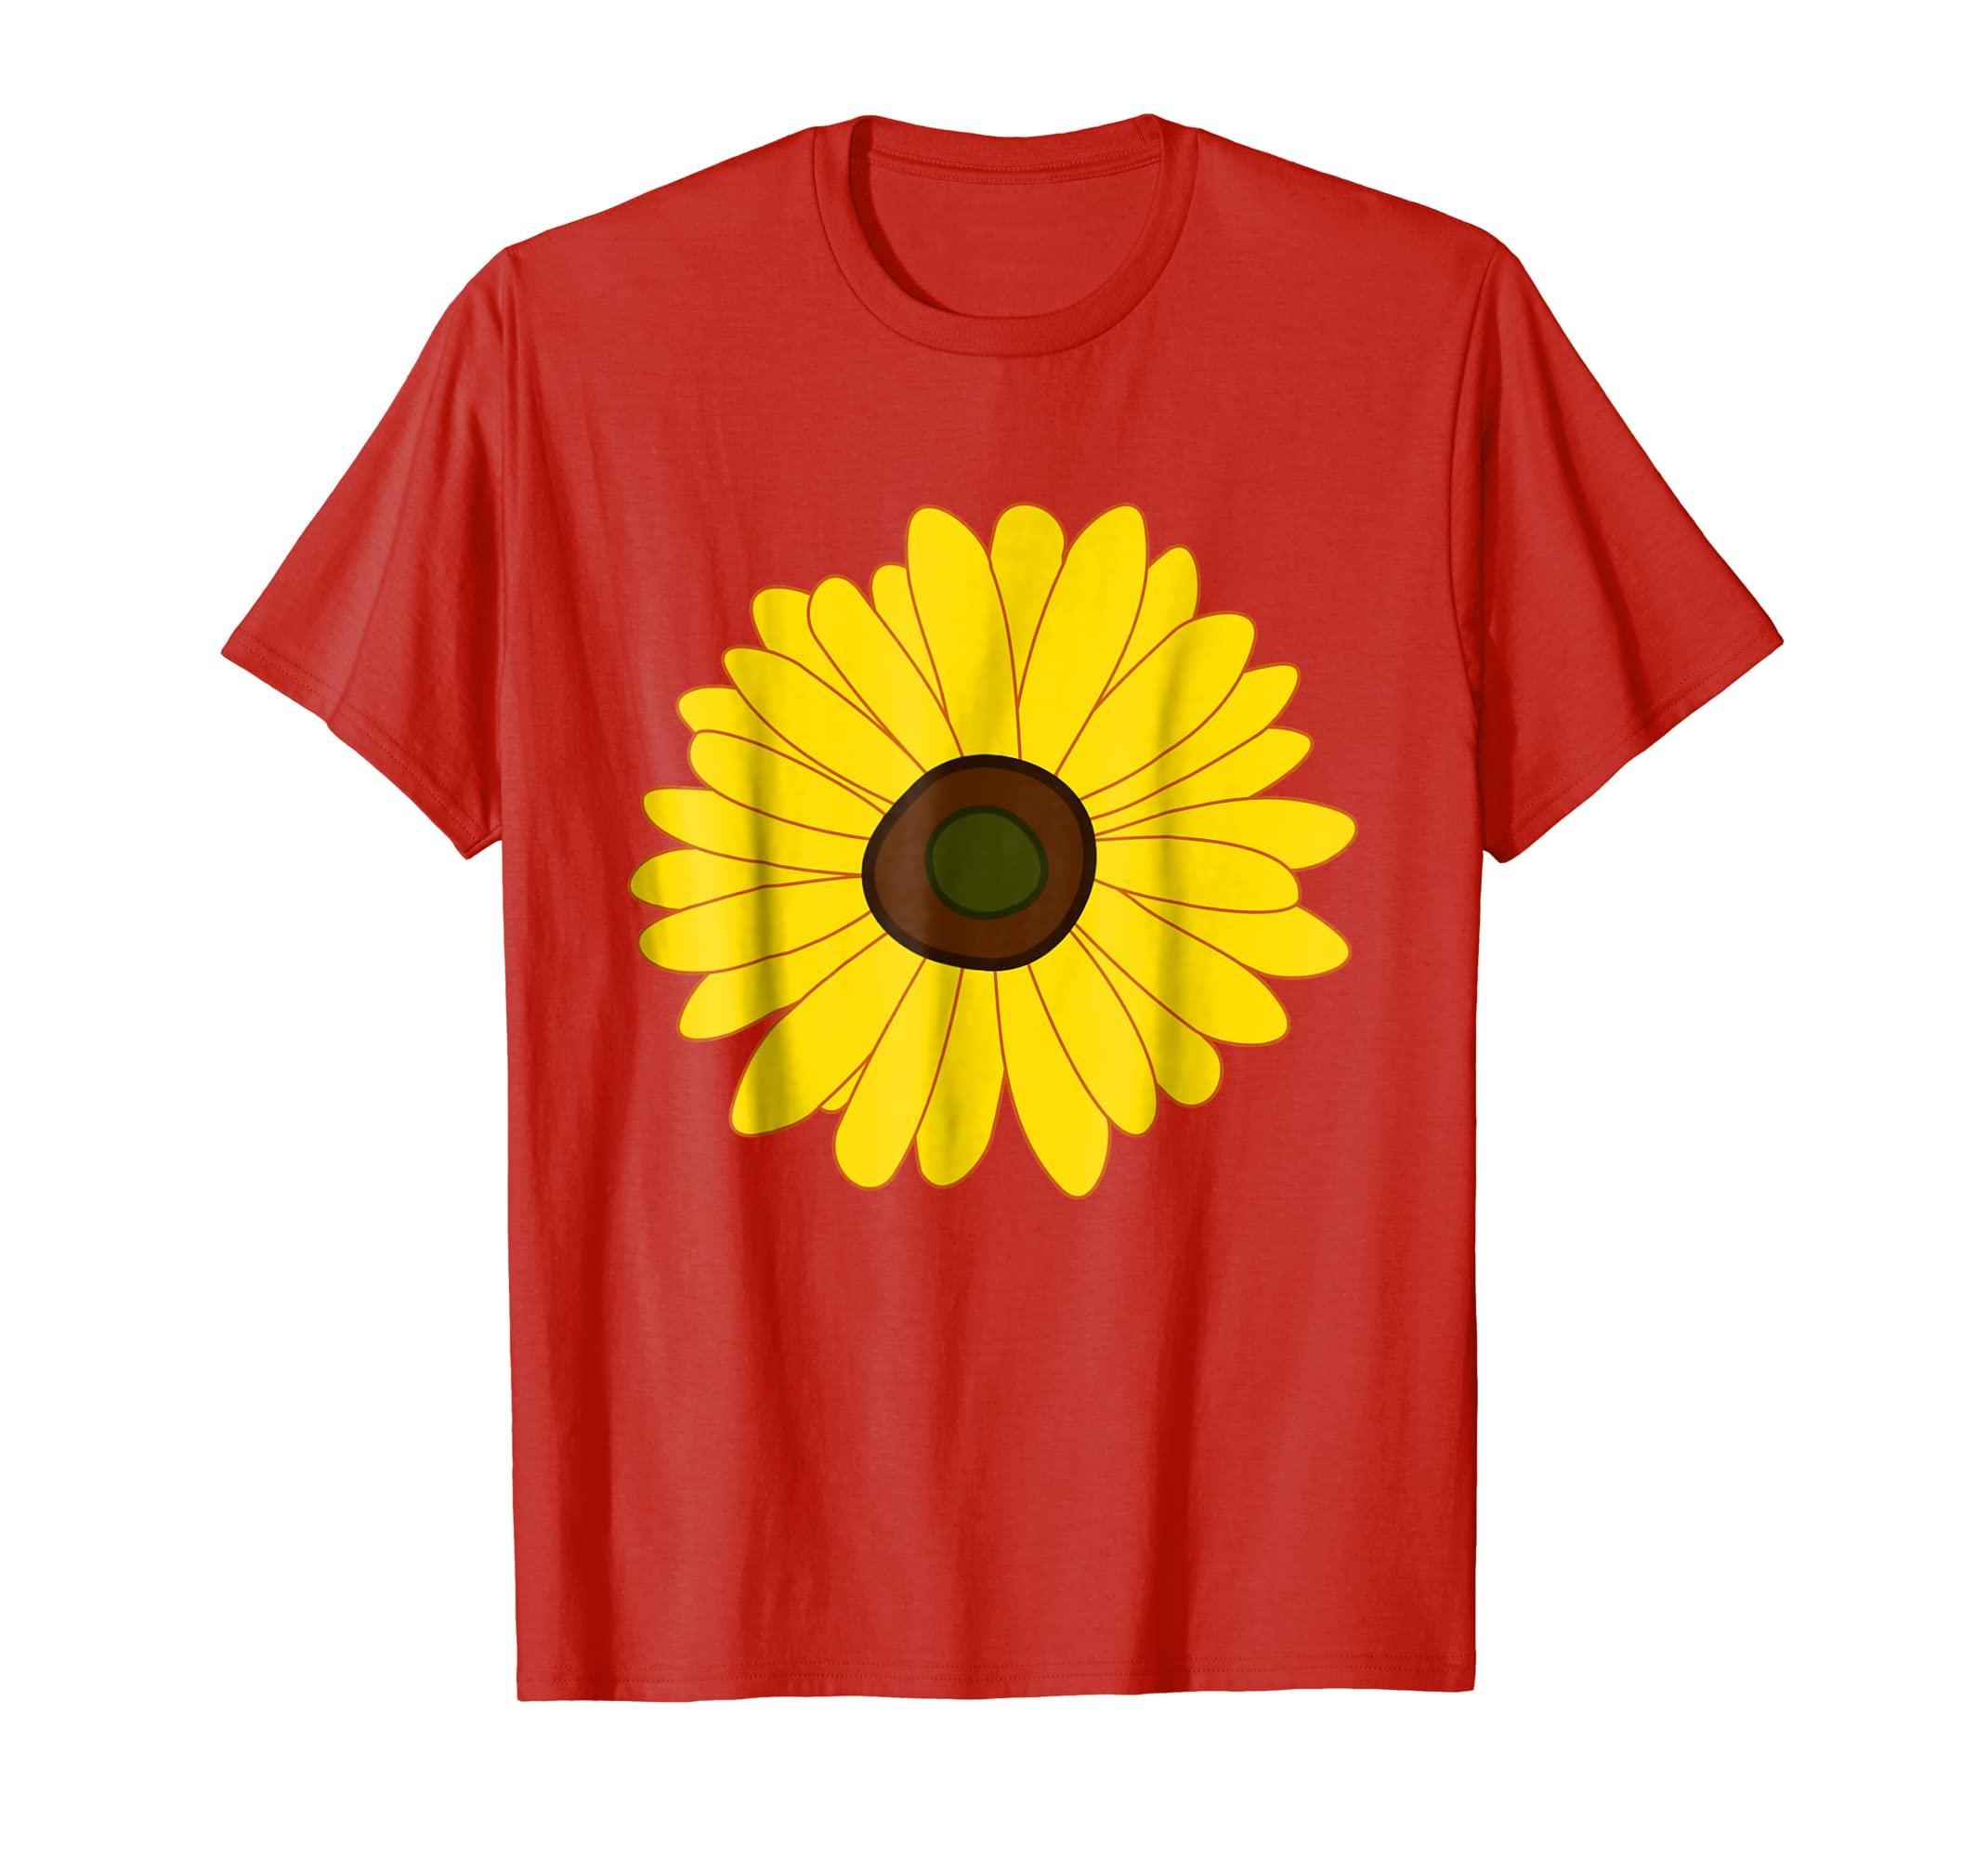 Sunflower - Simple Bright Sunny Yellow Flower T-Shirt-alottee gift